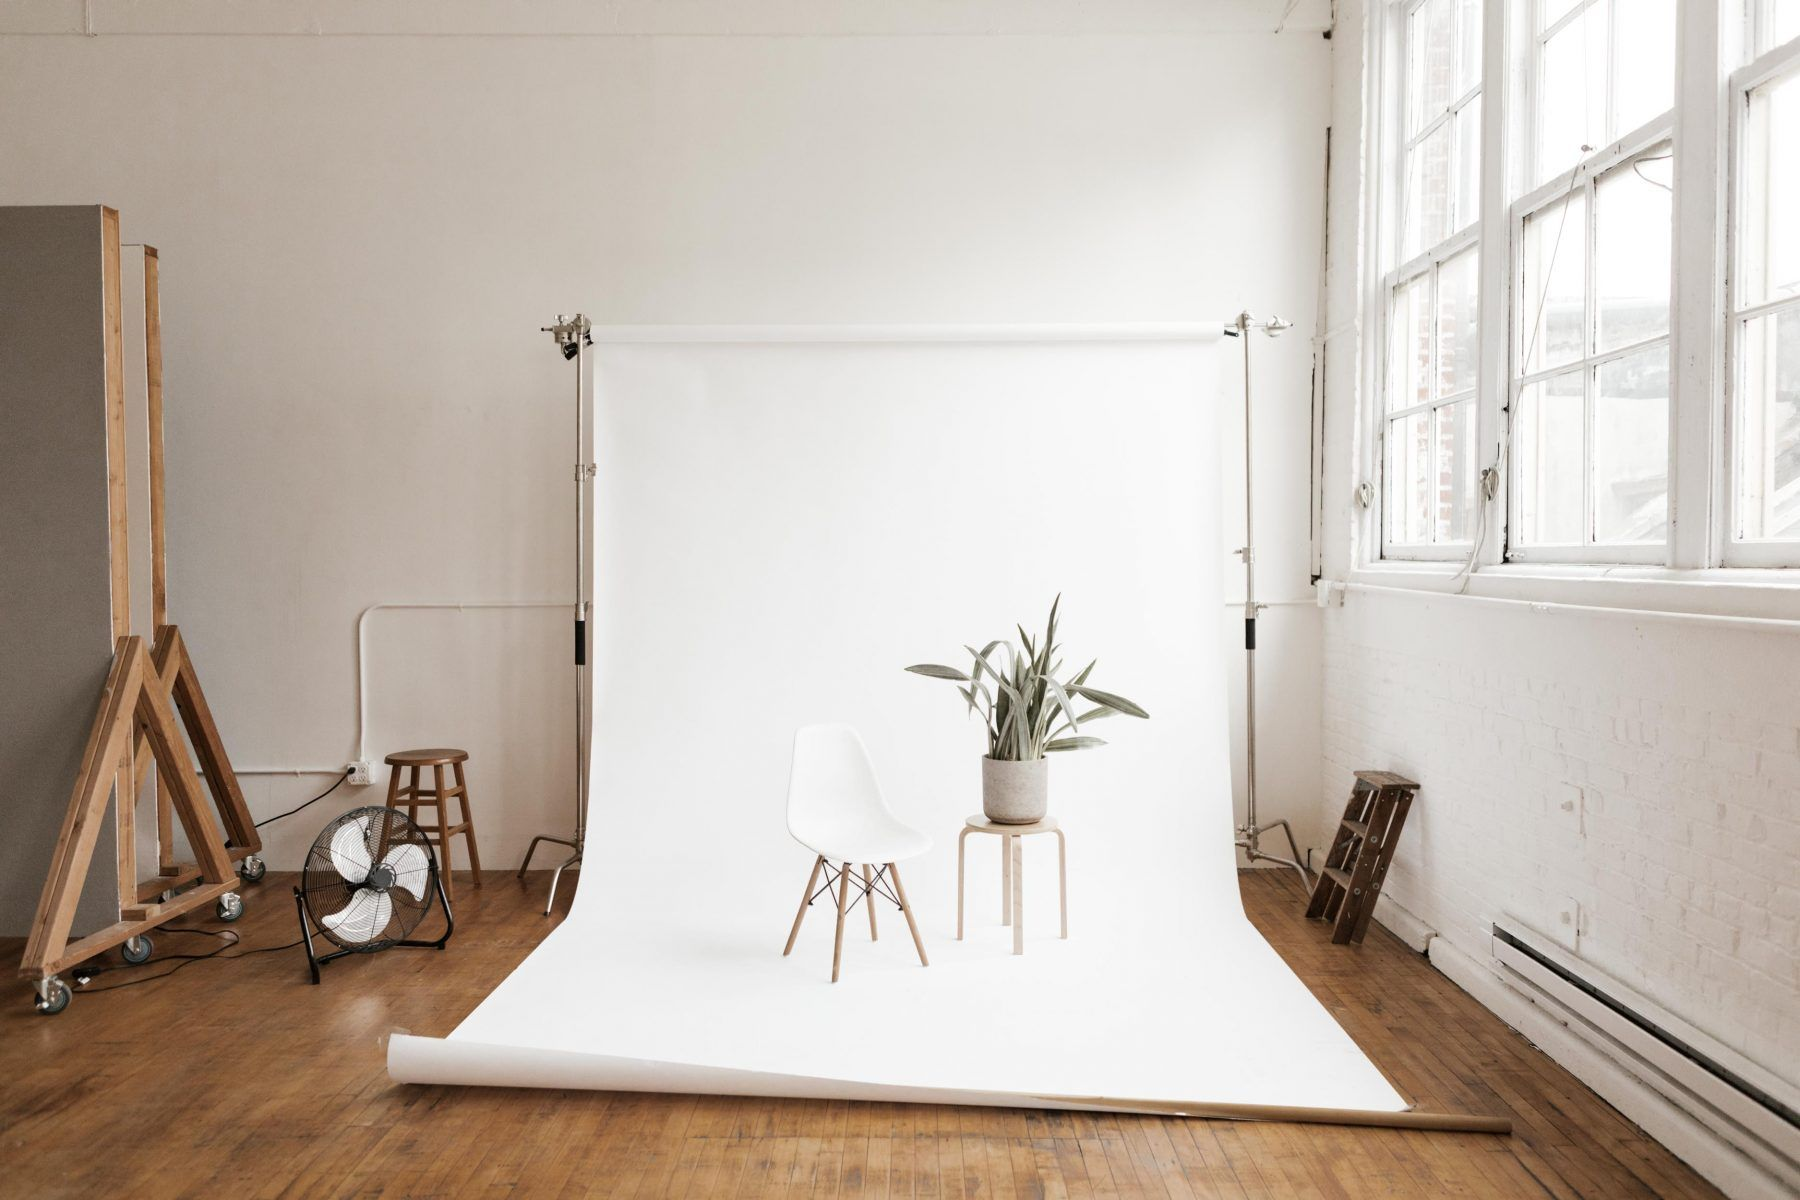 The Portland Studio Home Studio Photography Studio Interior Small Photography Studio